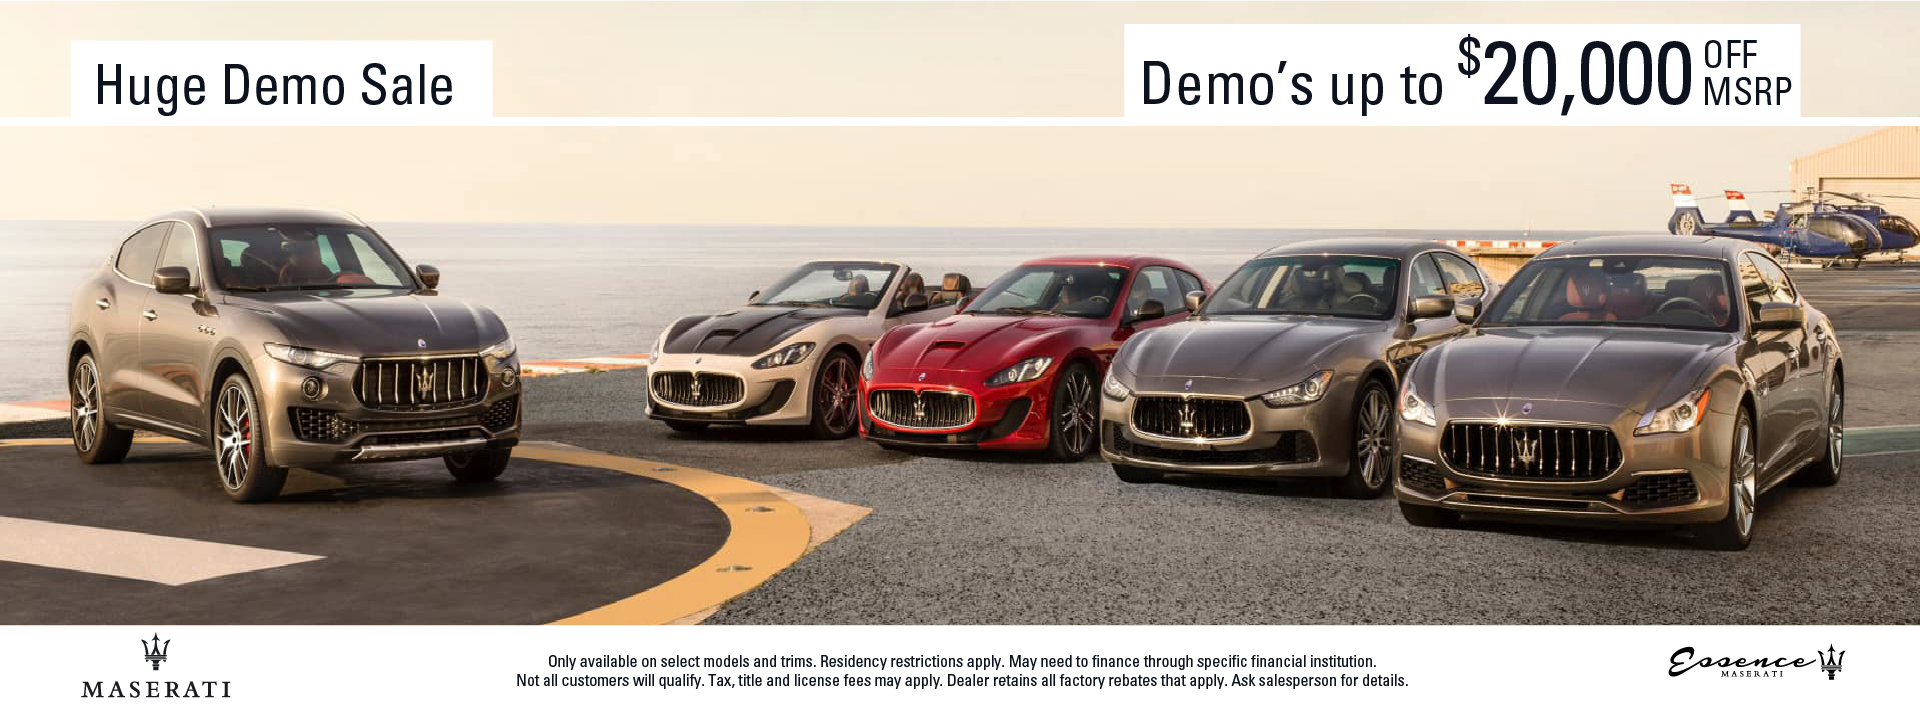 Maserati Demo Sale Juy Retooled